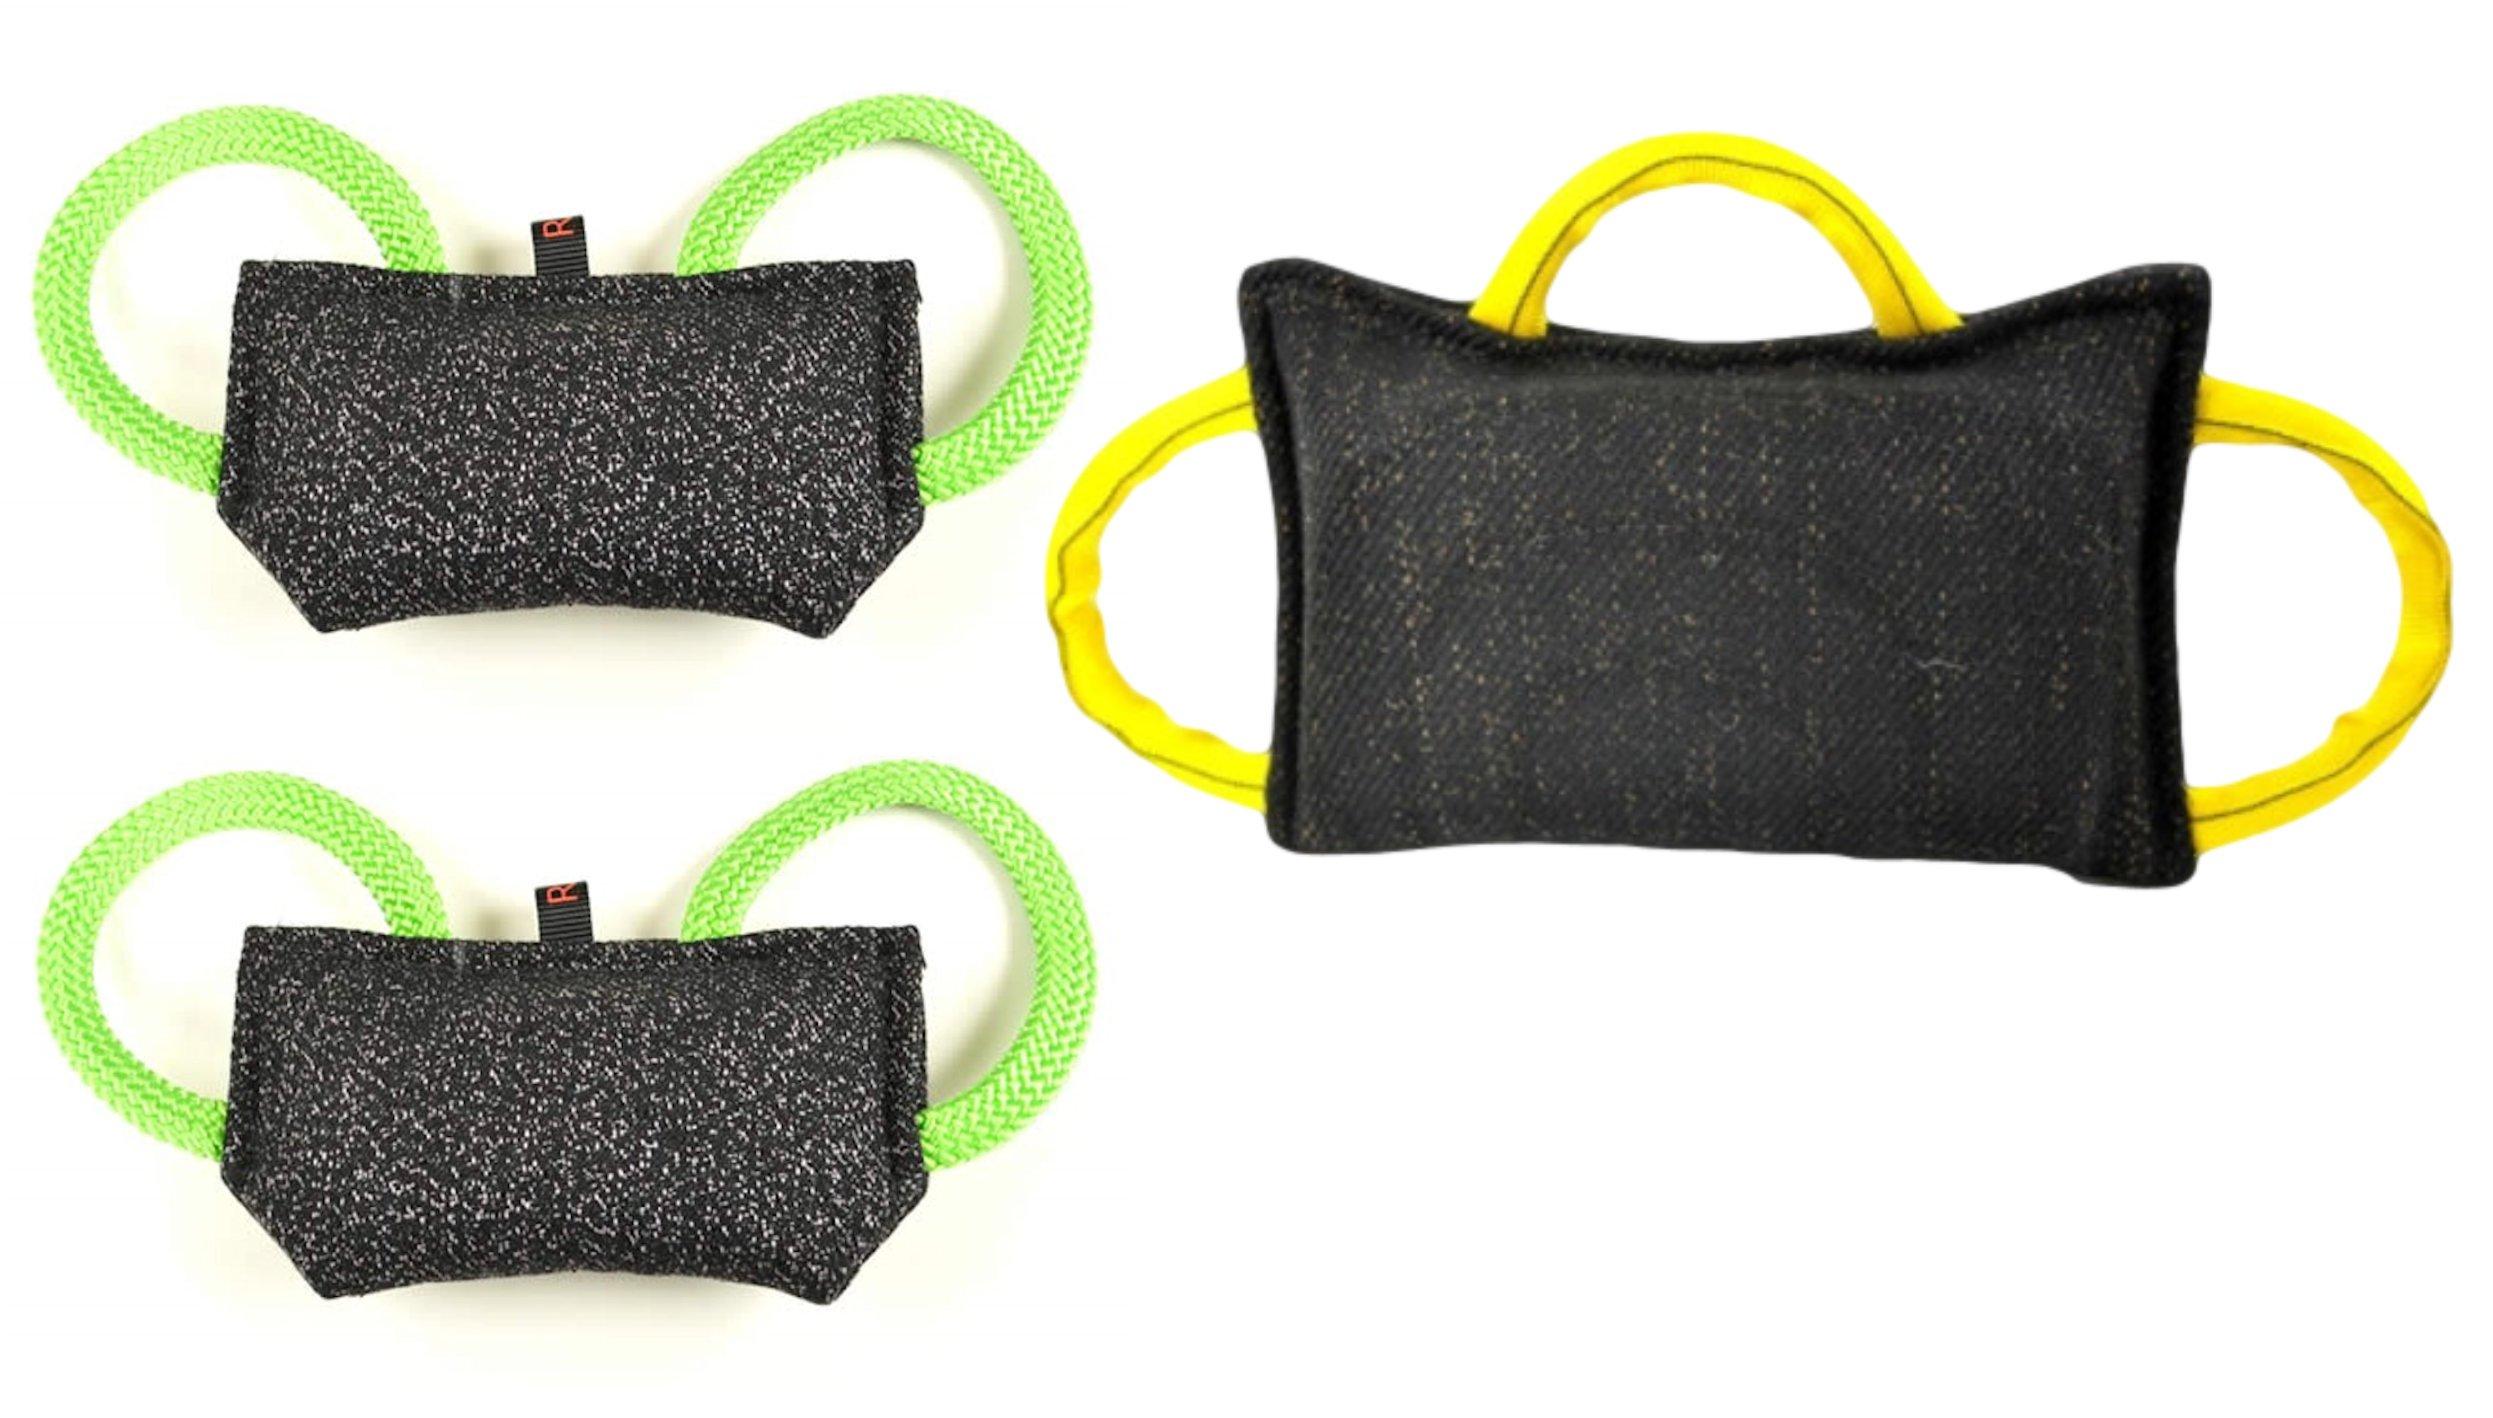 Bundle 1 - 3 Handle Bite Pillow (15.5'' X 9.75'') 2 - 2 Handle Puppy Bite Pillow (9.5'' X 4.75'') French Linen - Redline K9